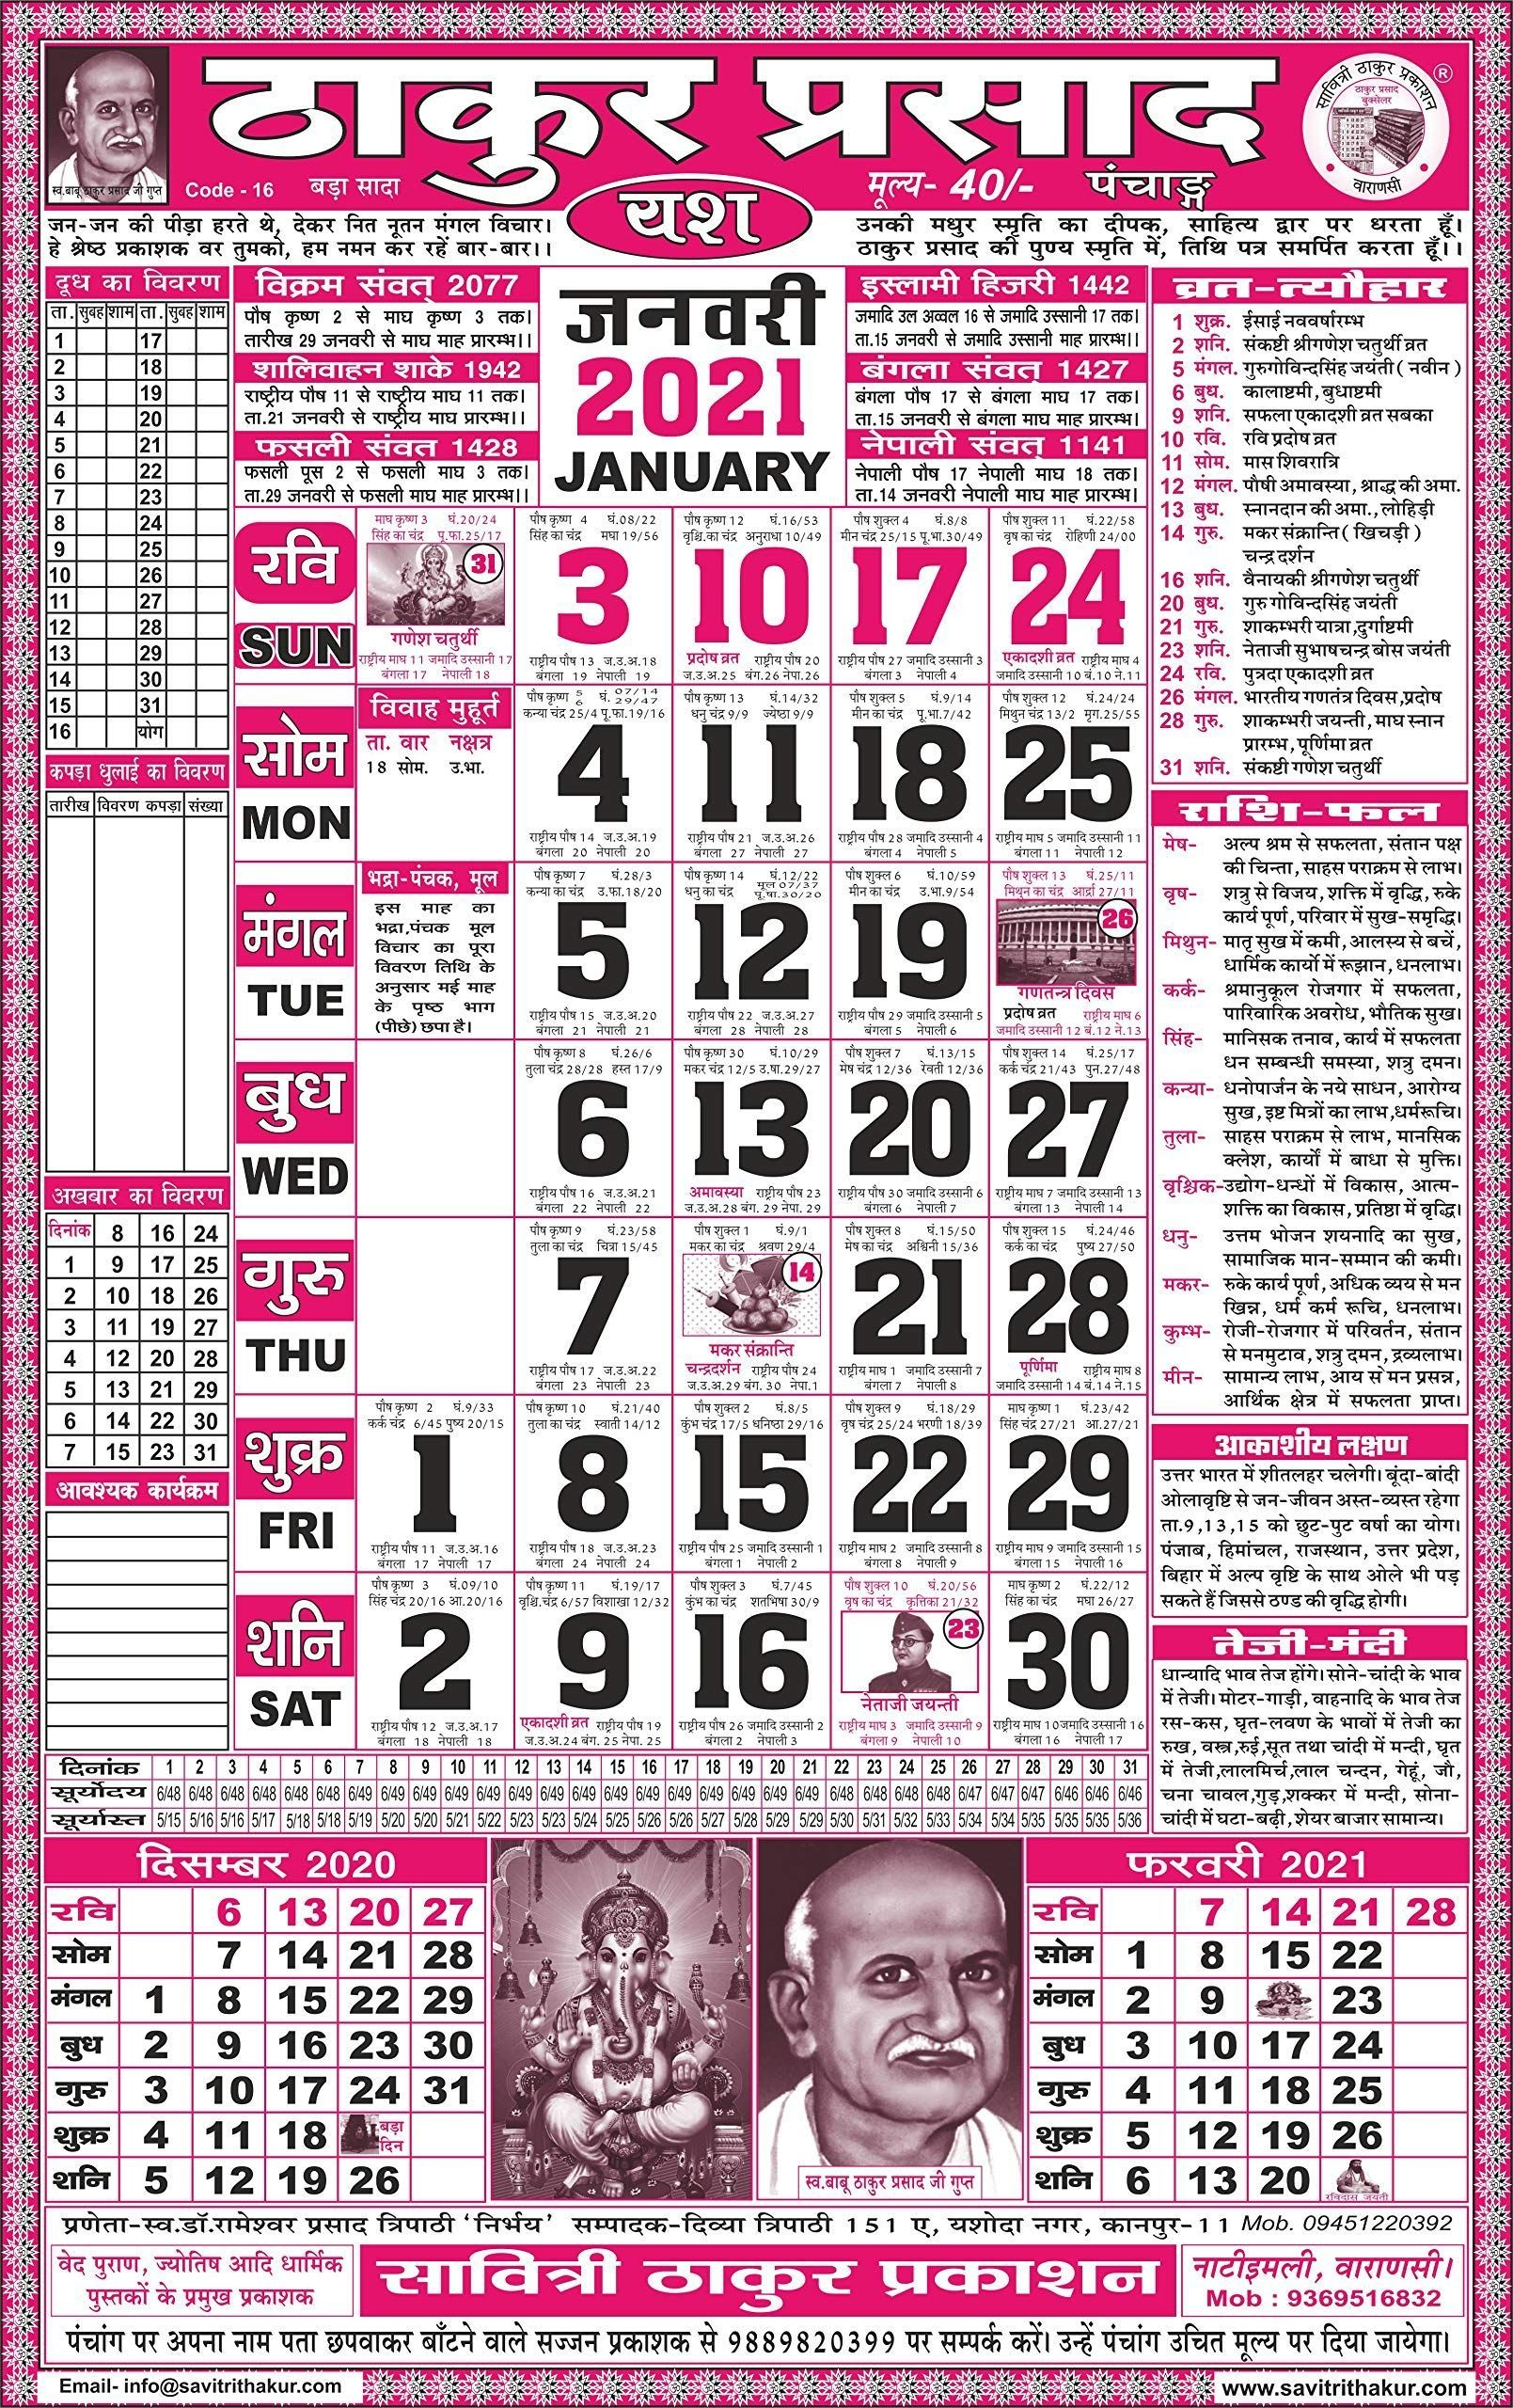 Thakur Prasad Panchang 2021 Calendar. | 2021 Calendar